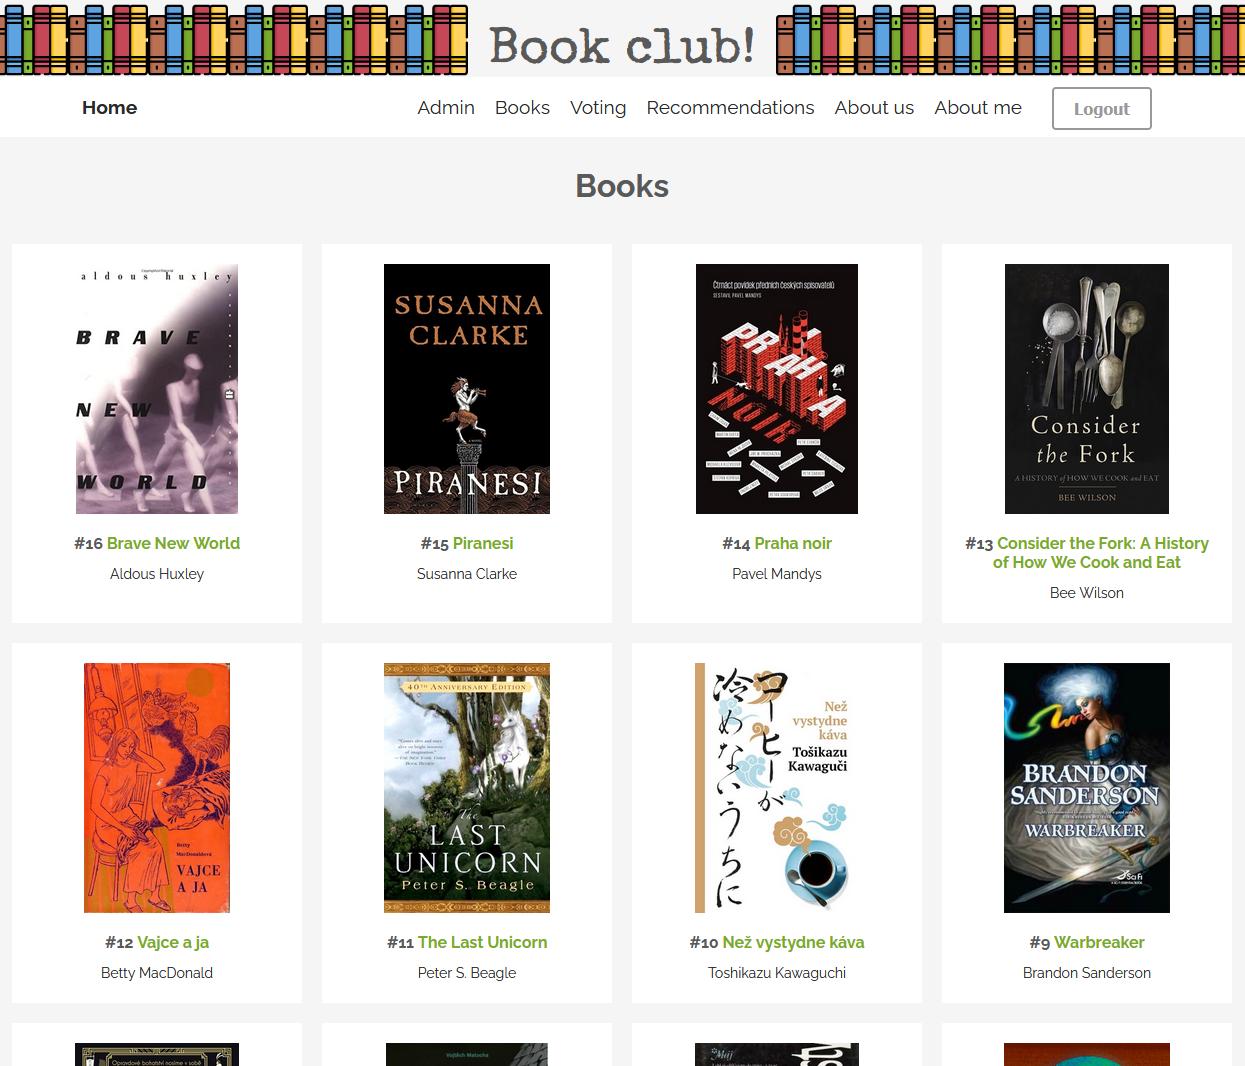 All books